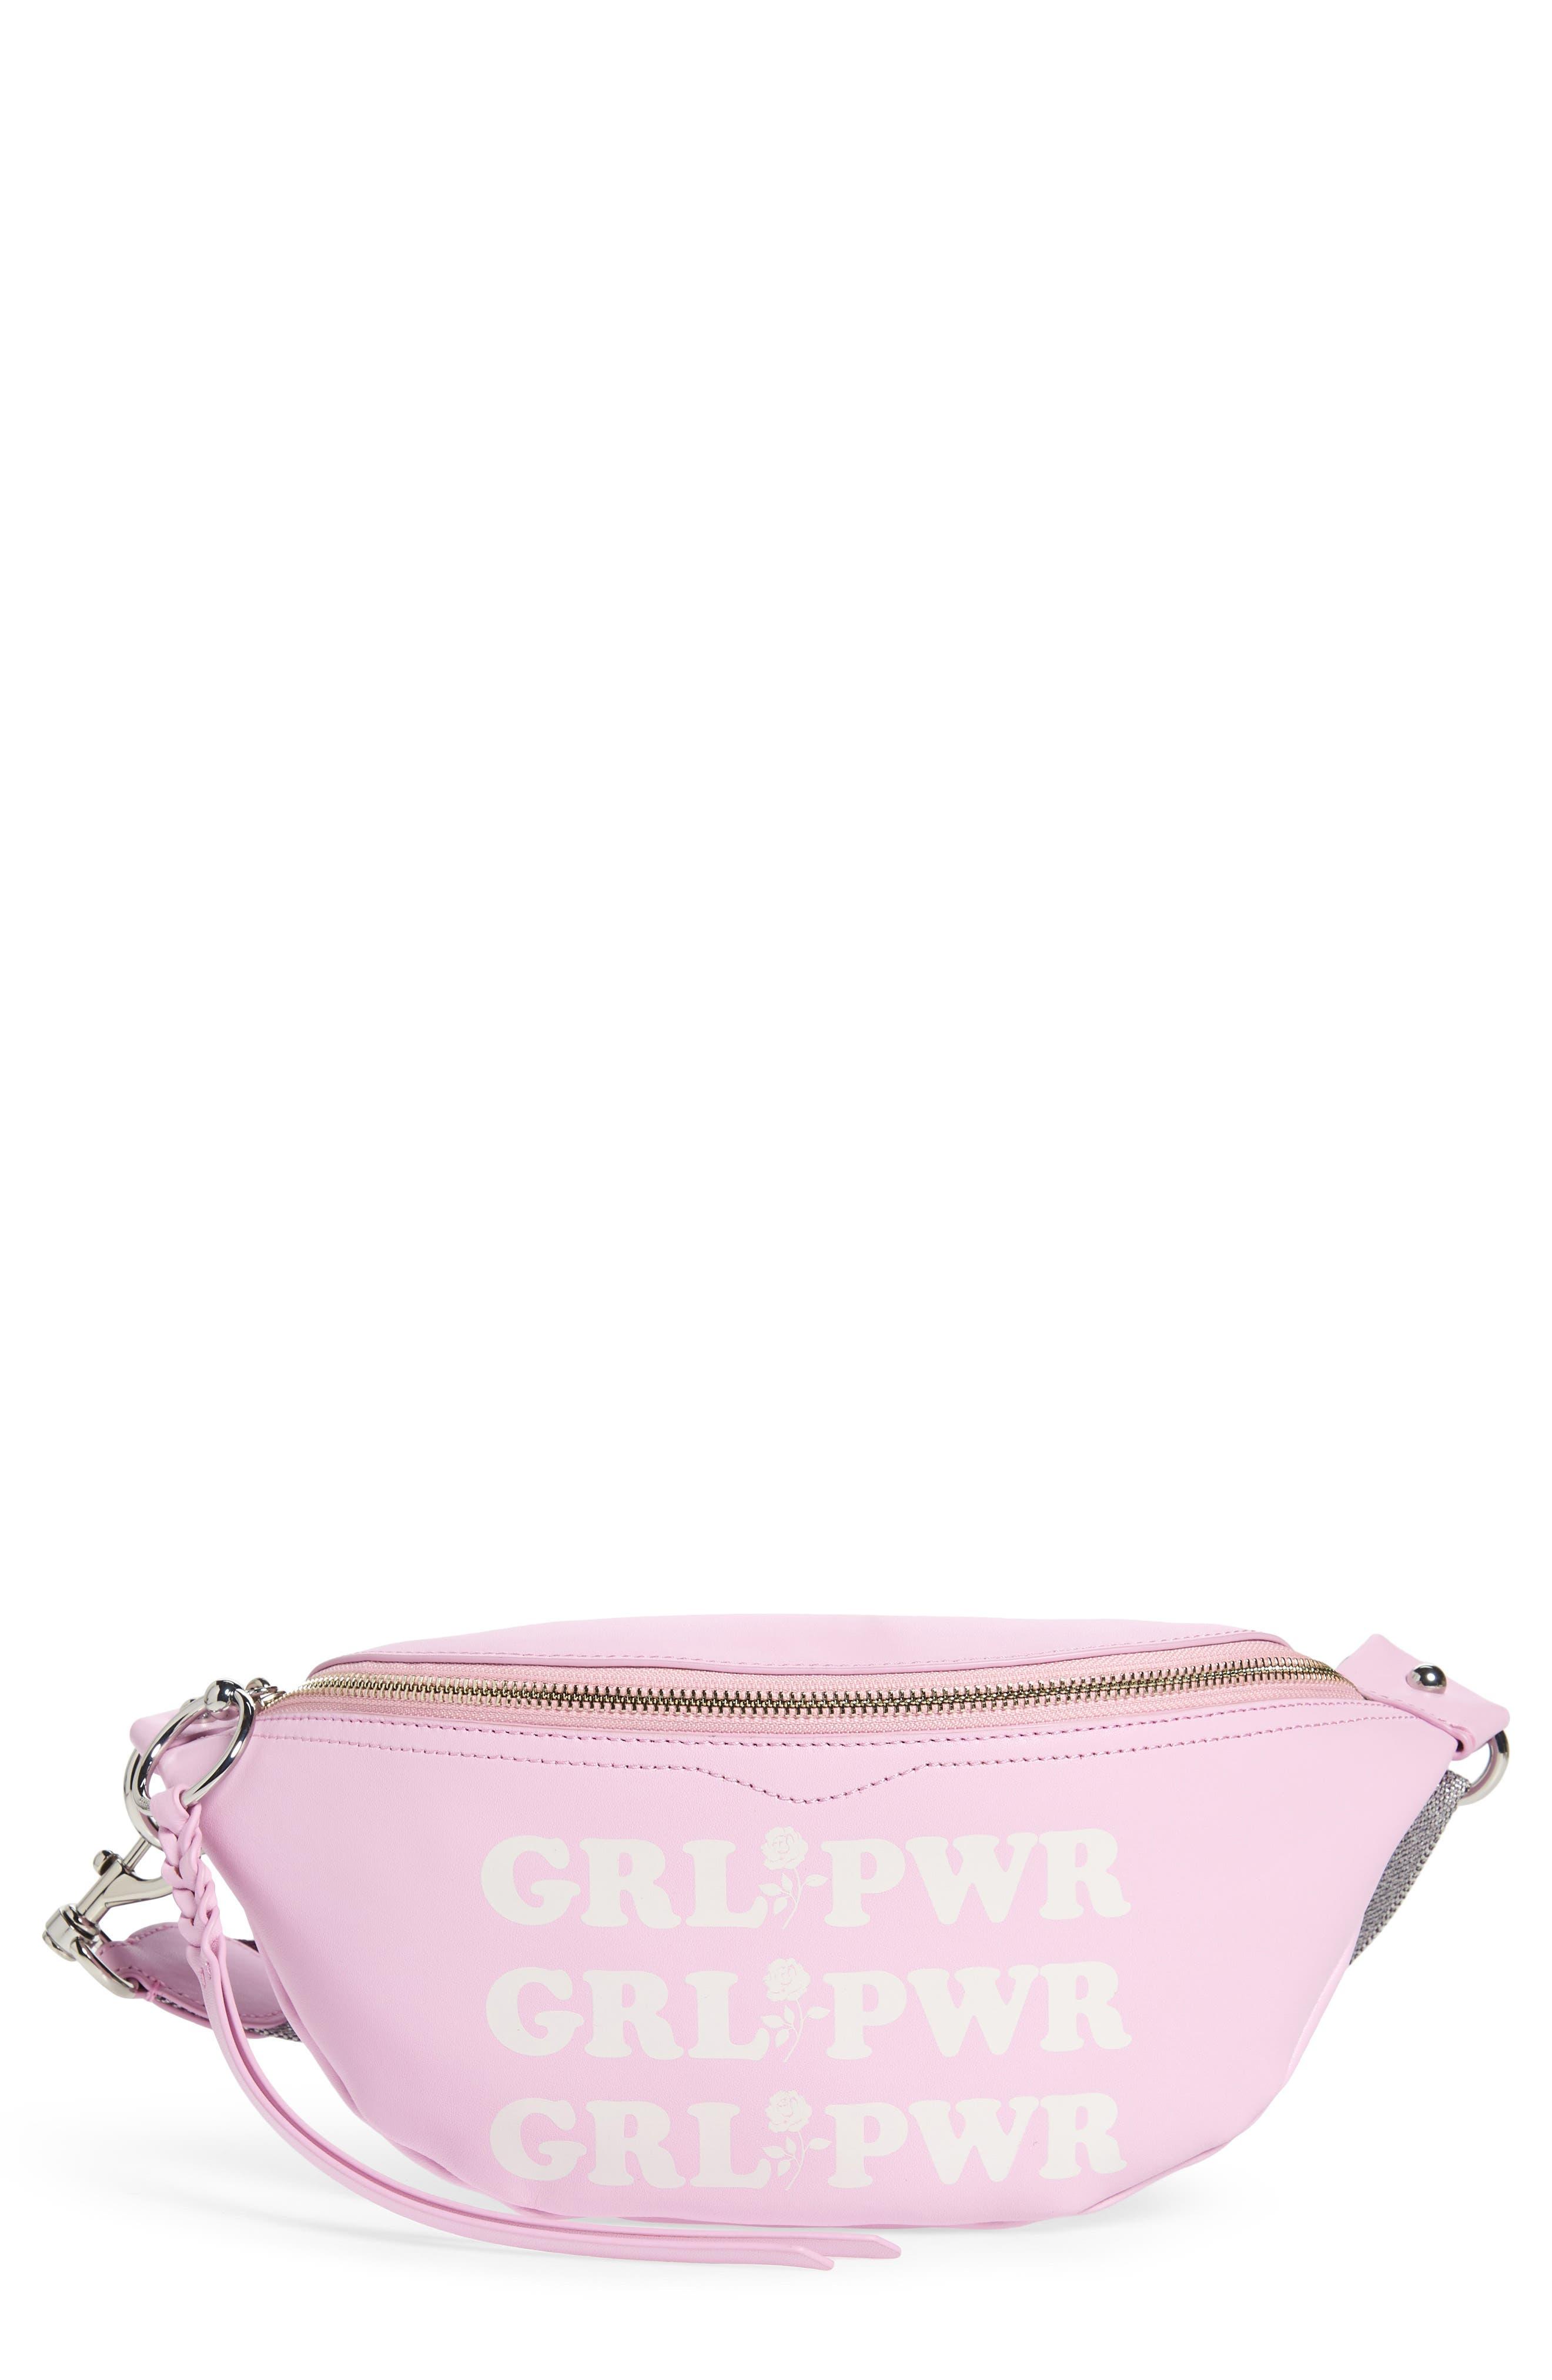 REBECCA MINKOFF Bree - GRL PWR Leather Belt Bag, Main, color, 500